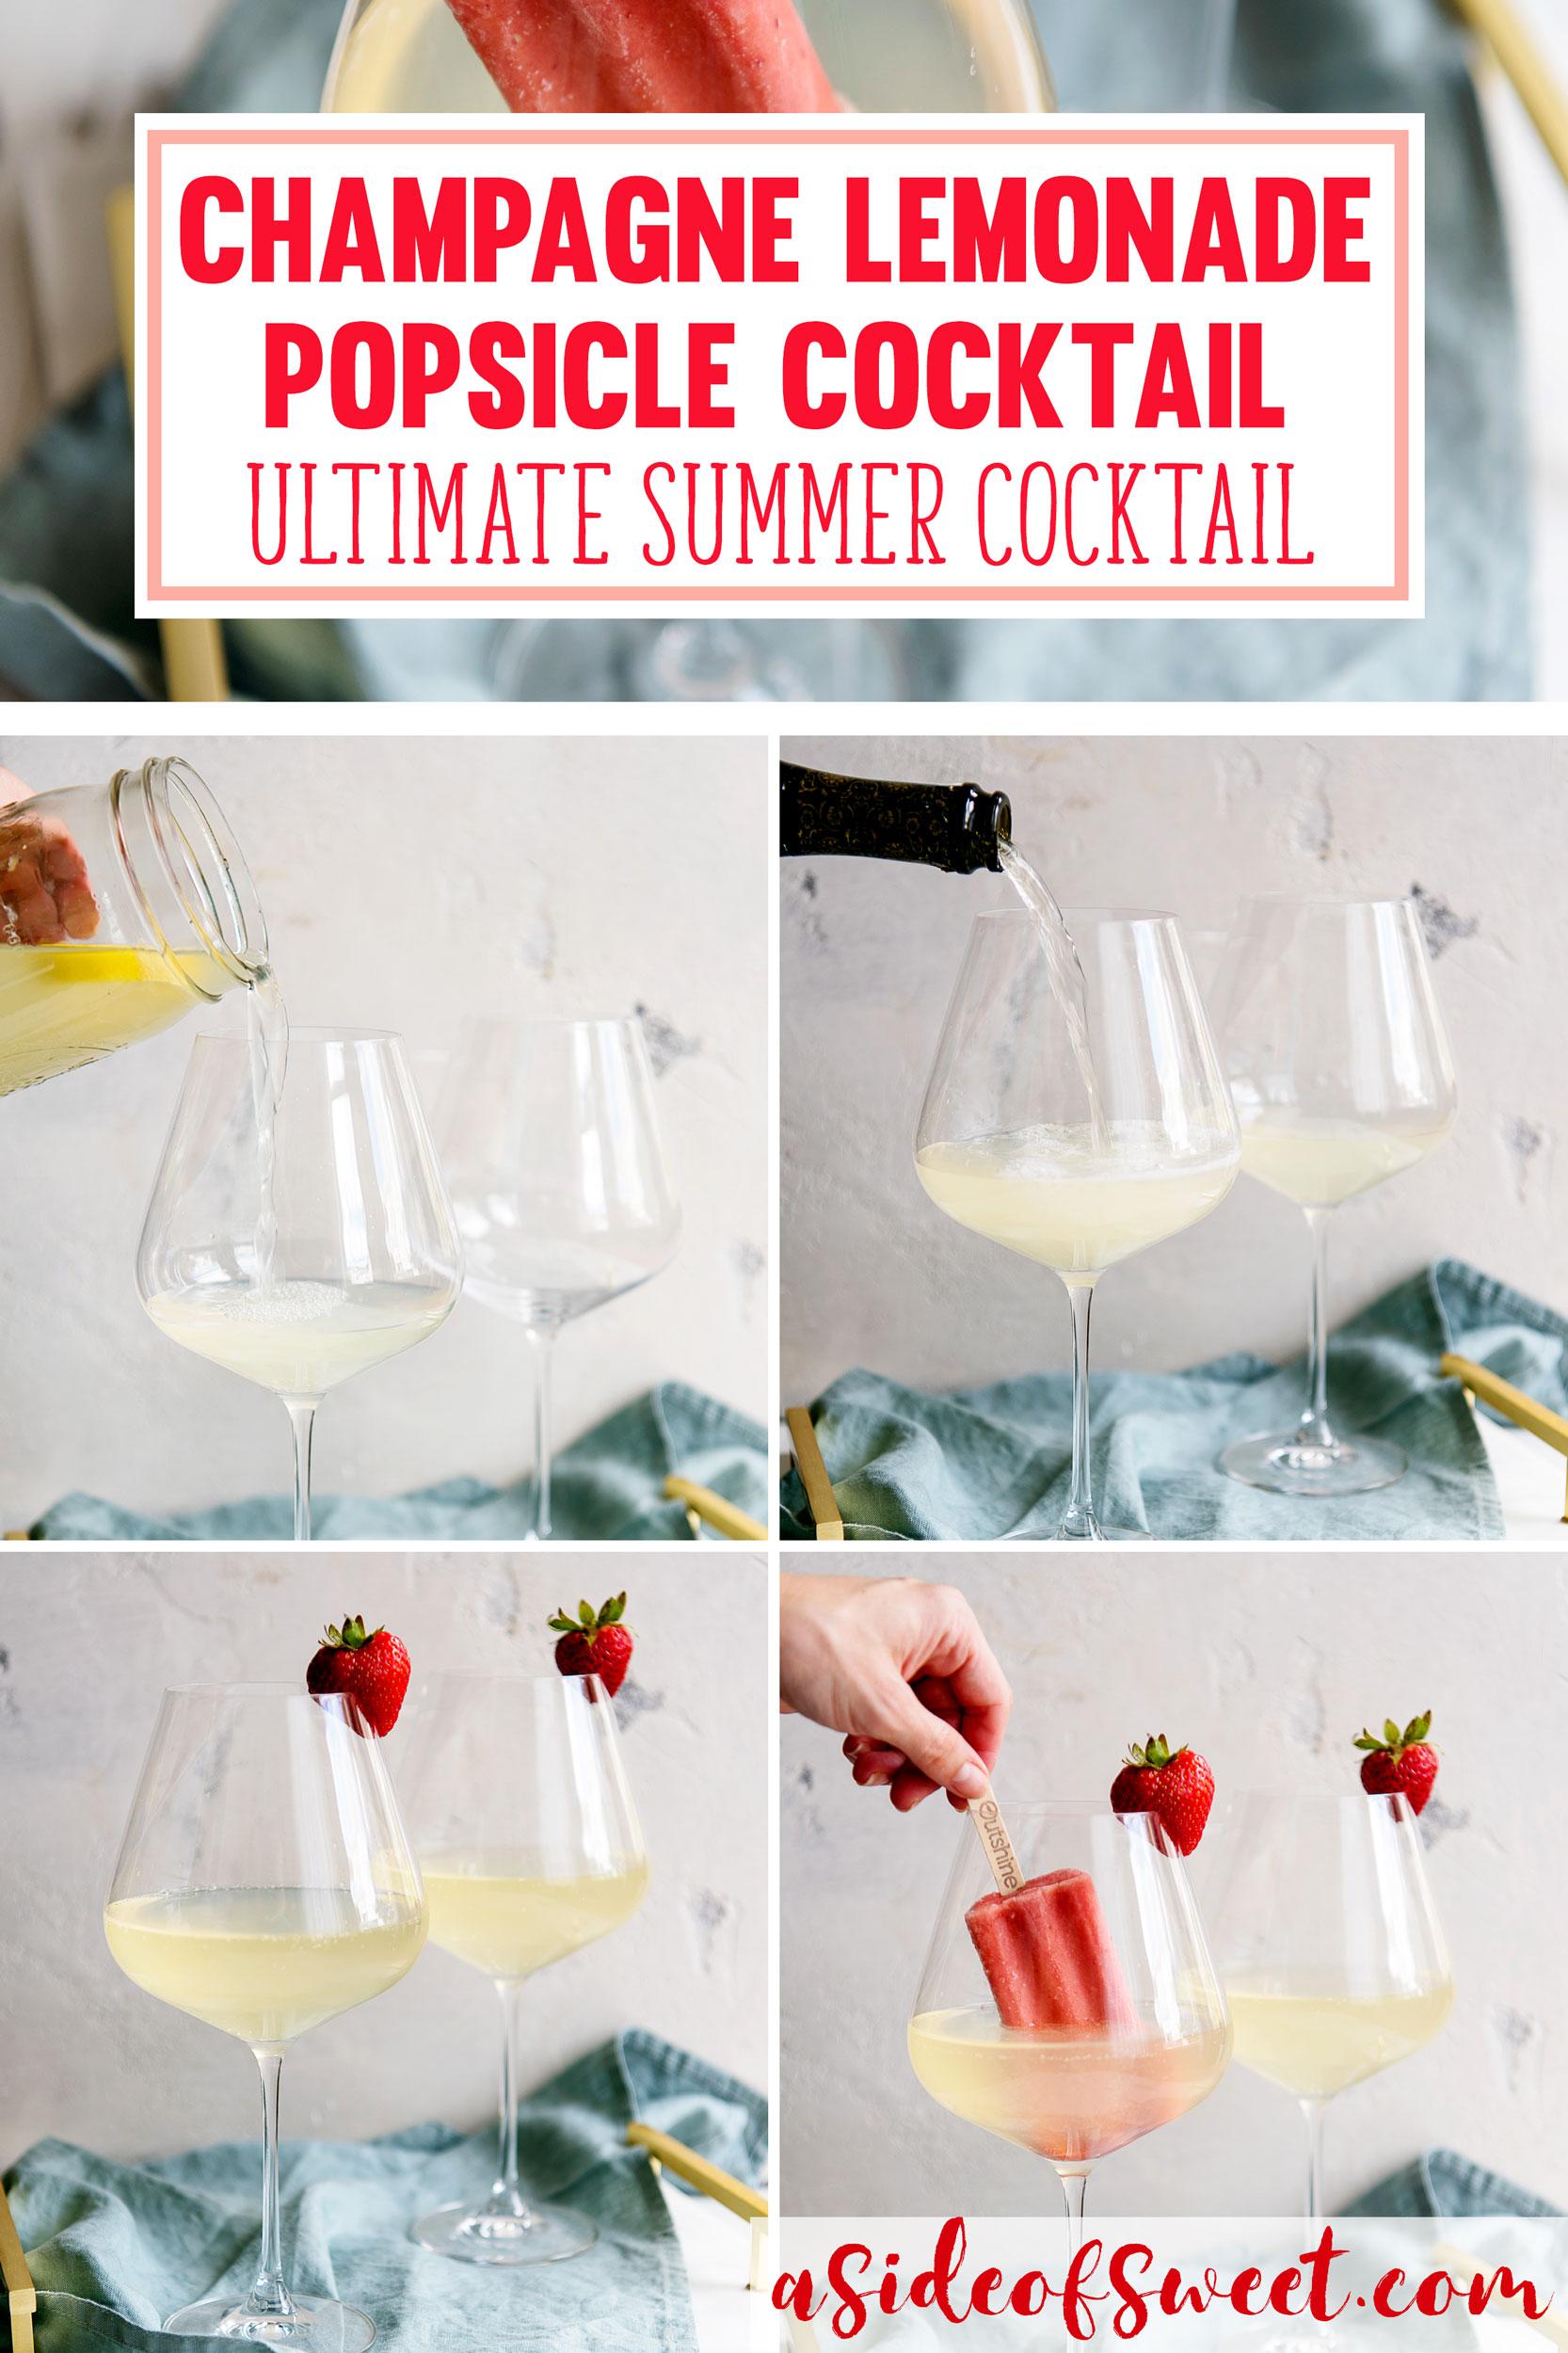 Champagne Lemonade Summer Cocktail Recipe - Strawberry Lemonade Popsicle Alcoholic Drink Poptail #Recipe #Recipes #Summer #Cocktail